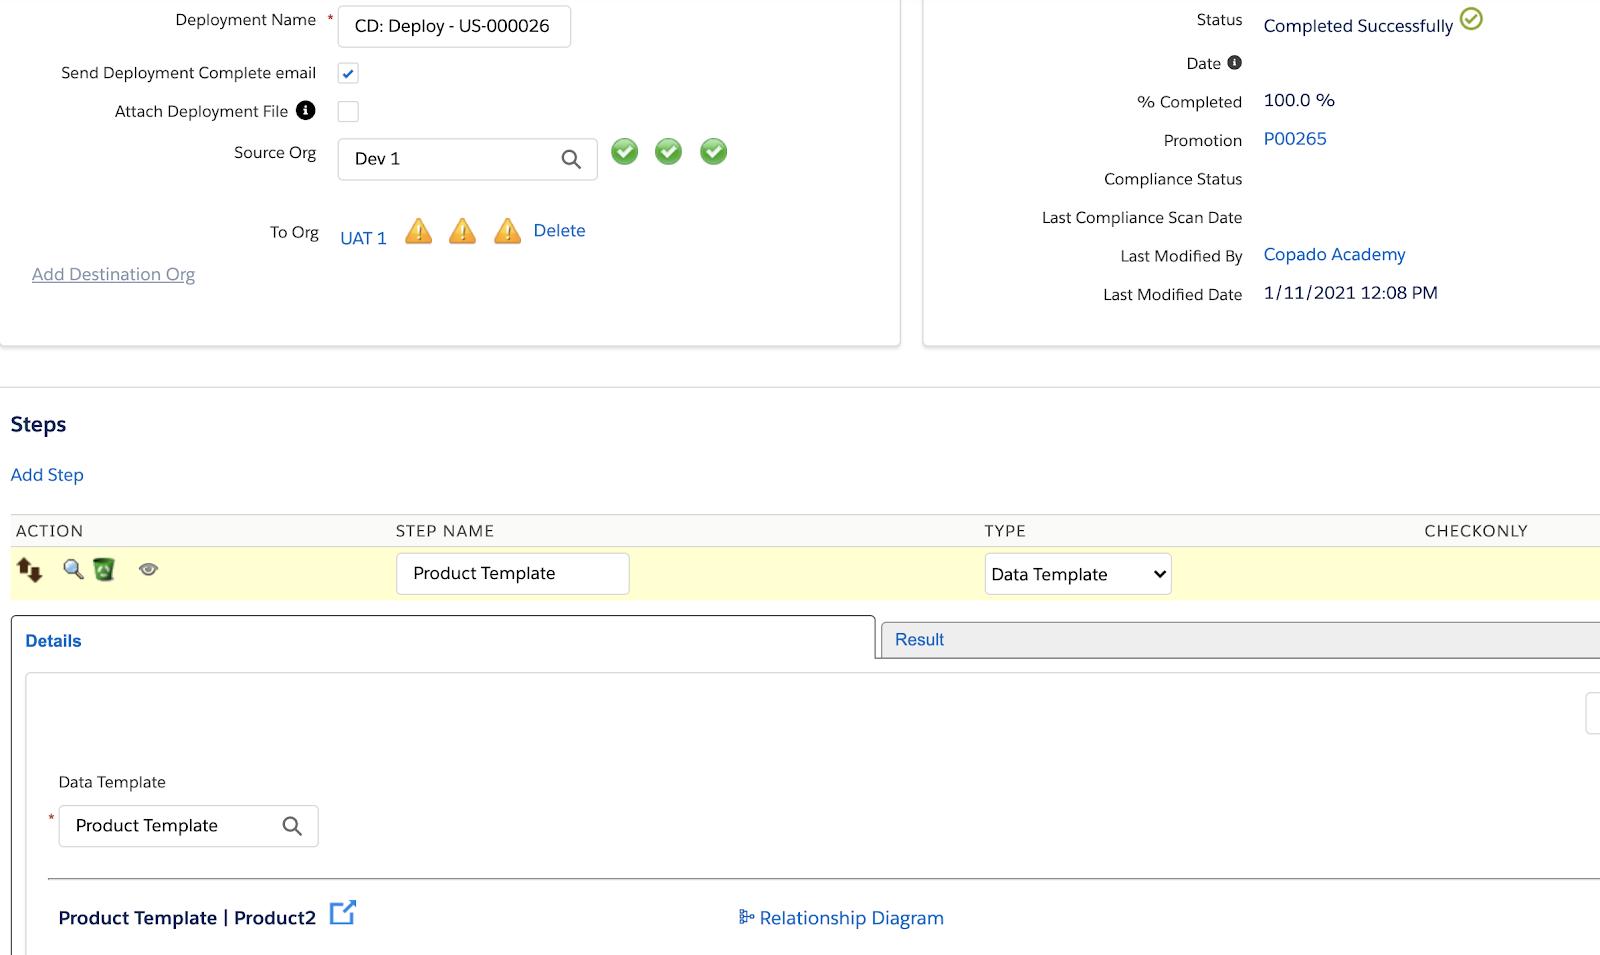 Data Template deployment step